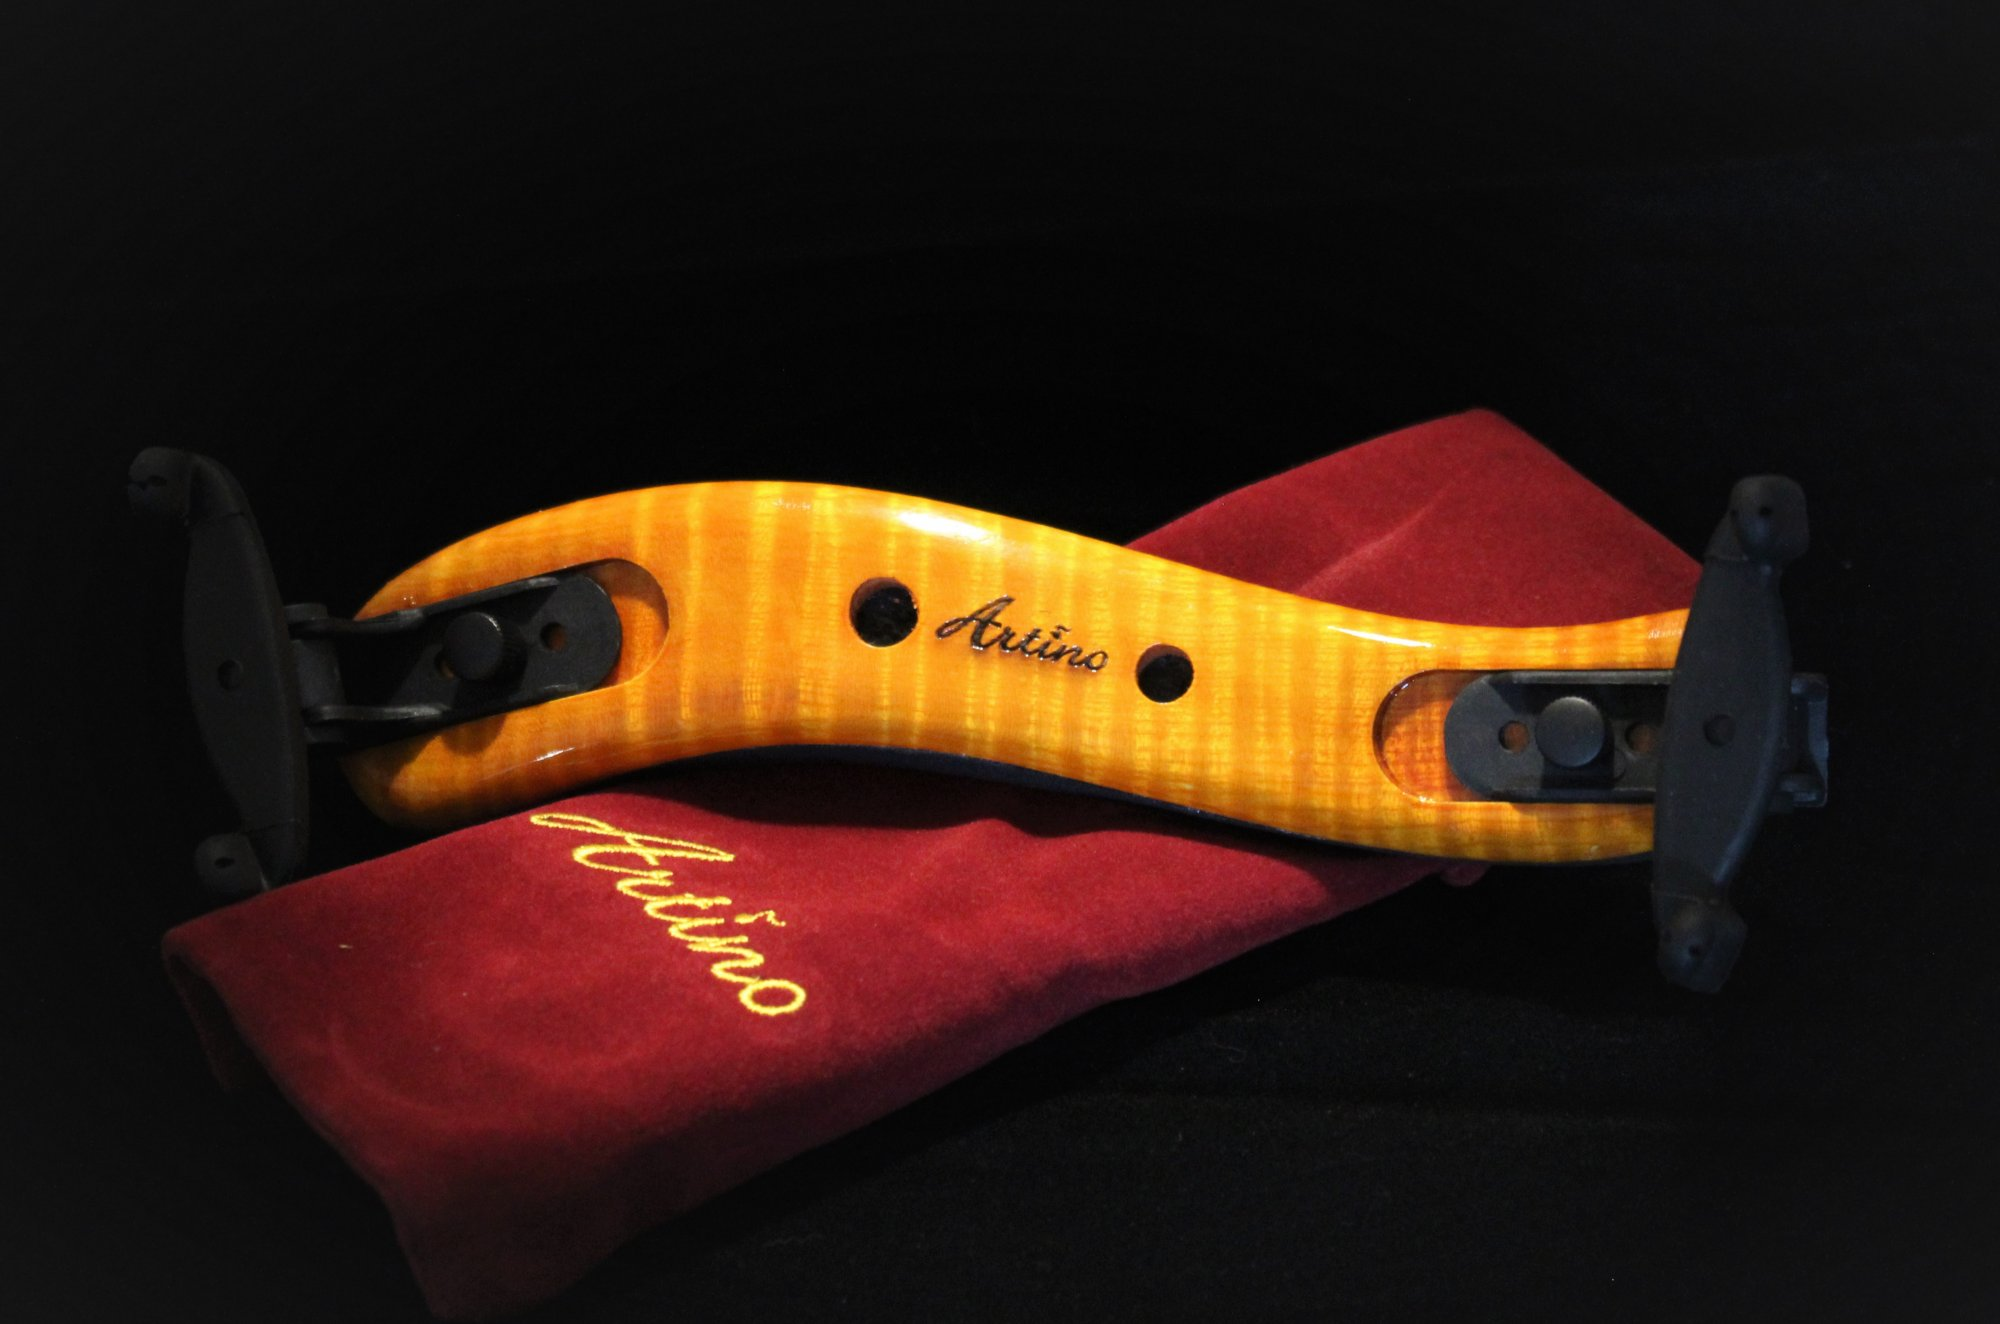 Artino Sound Model Maple Violin Shoulder Rest 3/4 - 4/4